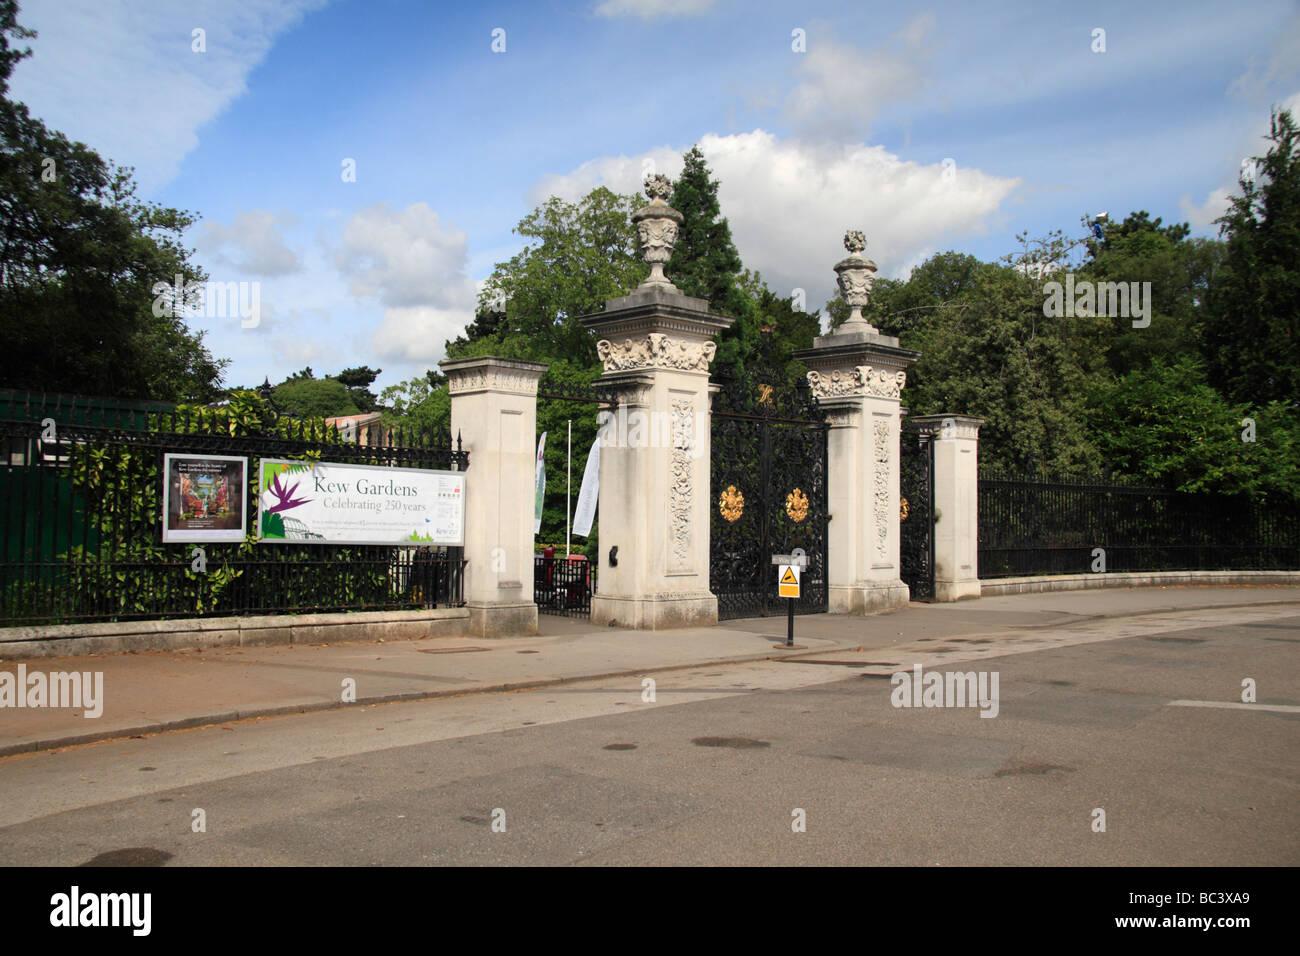 The Main Entrance to the Royal Botanic Gardens, Kew, Surrey, England. - Stock Image